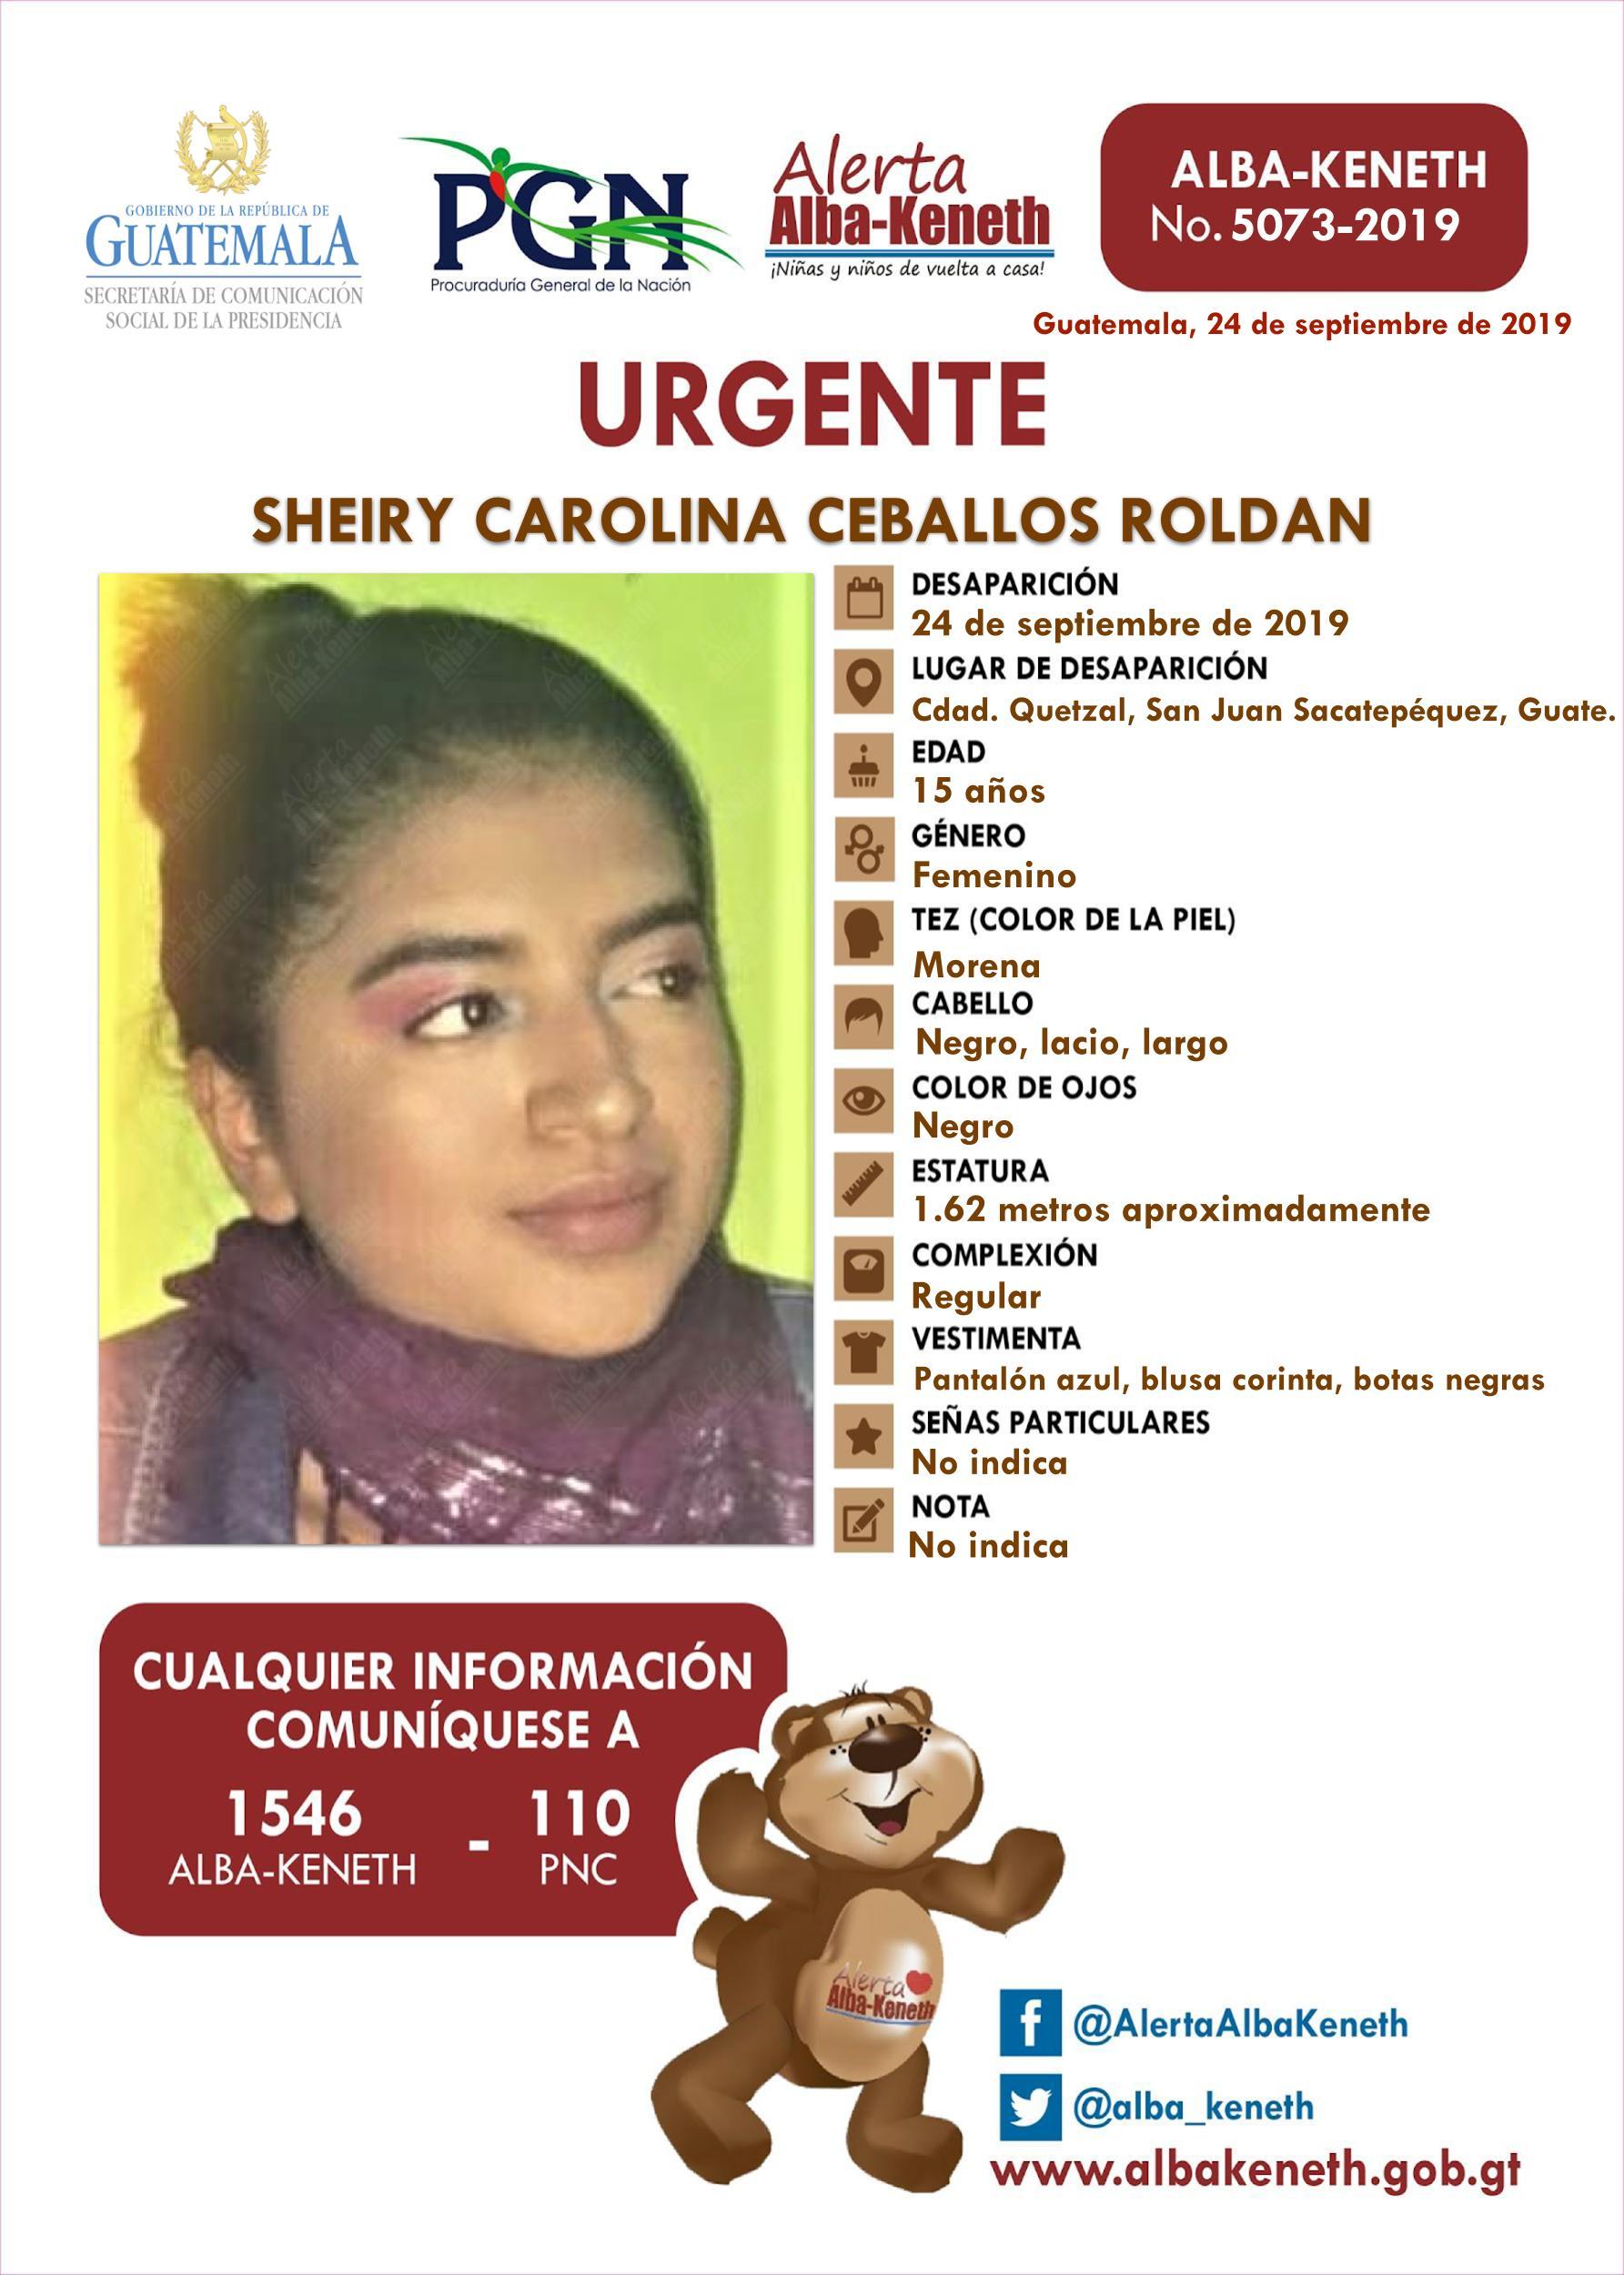 Sheiry Carolina Ceballos Roldan